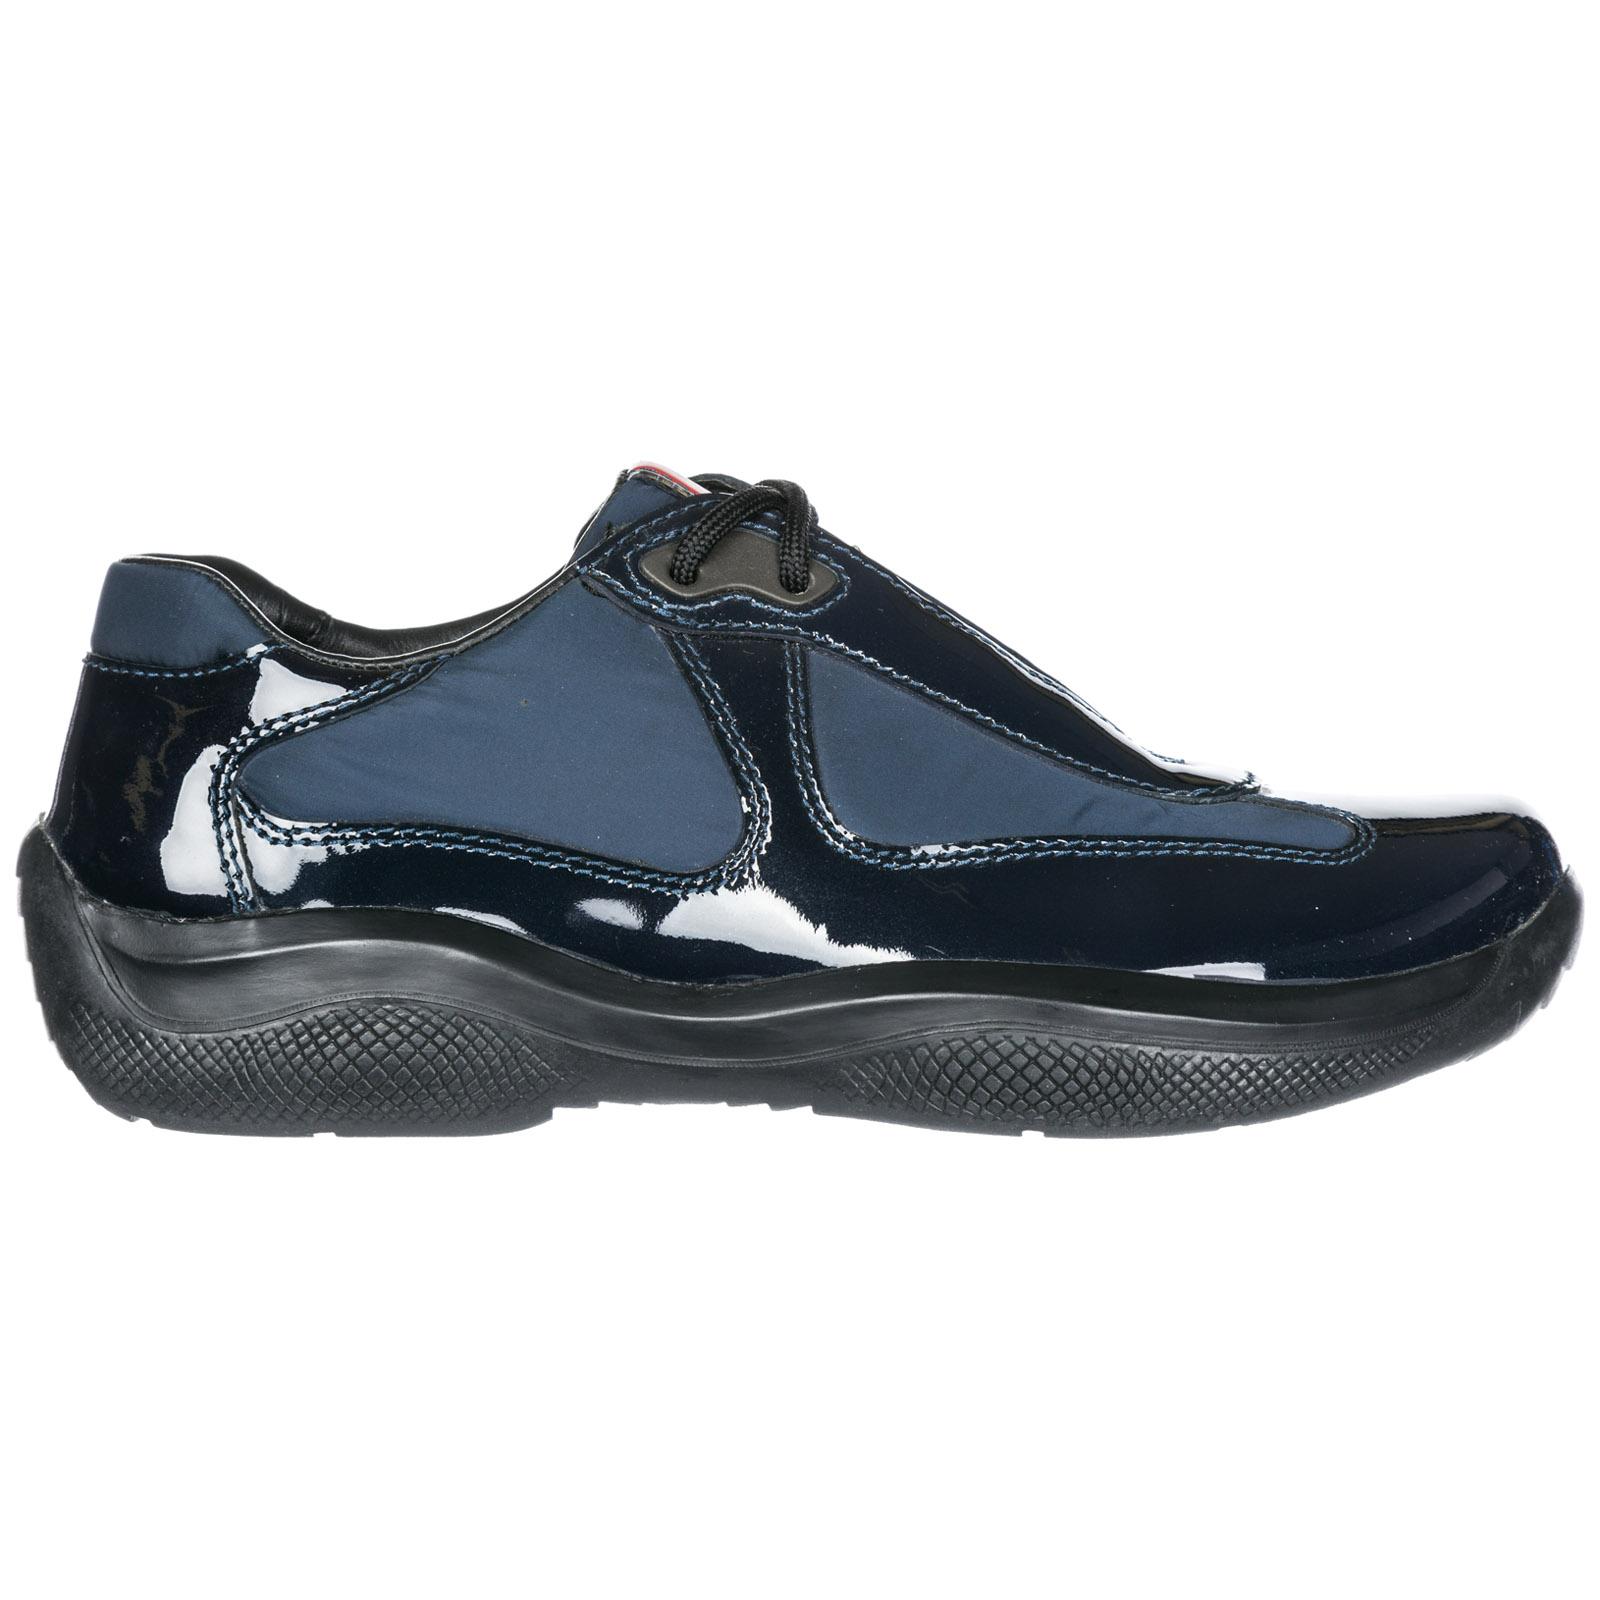 8ad0bcc02f6 Zapatillas deportivas Prada America s Cup PR3163 OW5 F044V blu ...